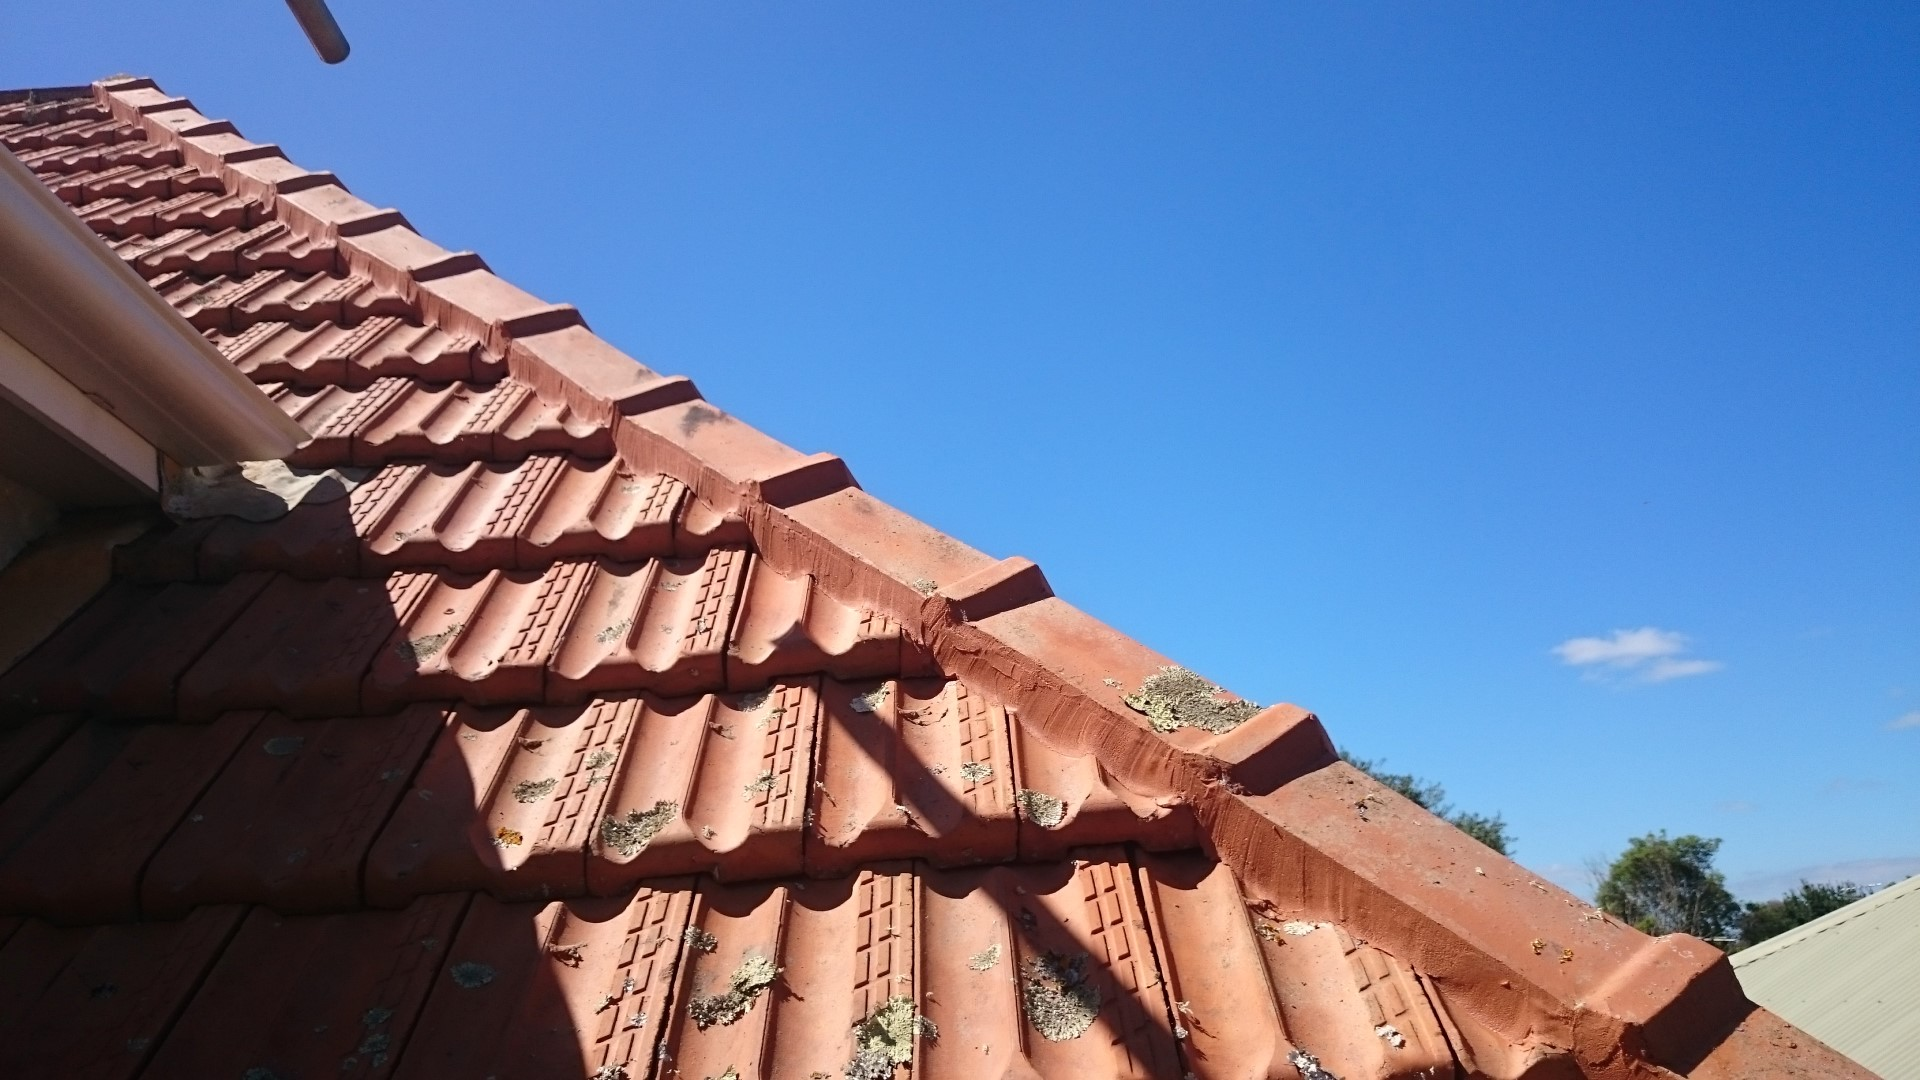 corner-of-clay-roof